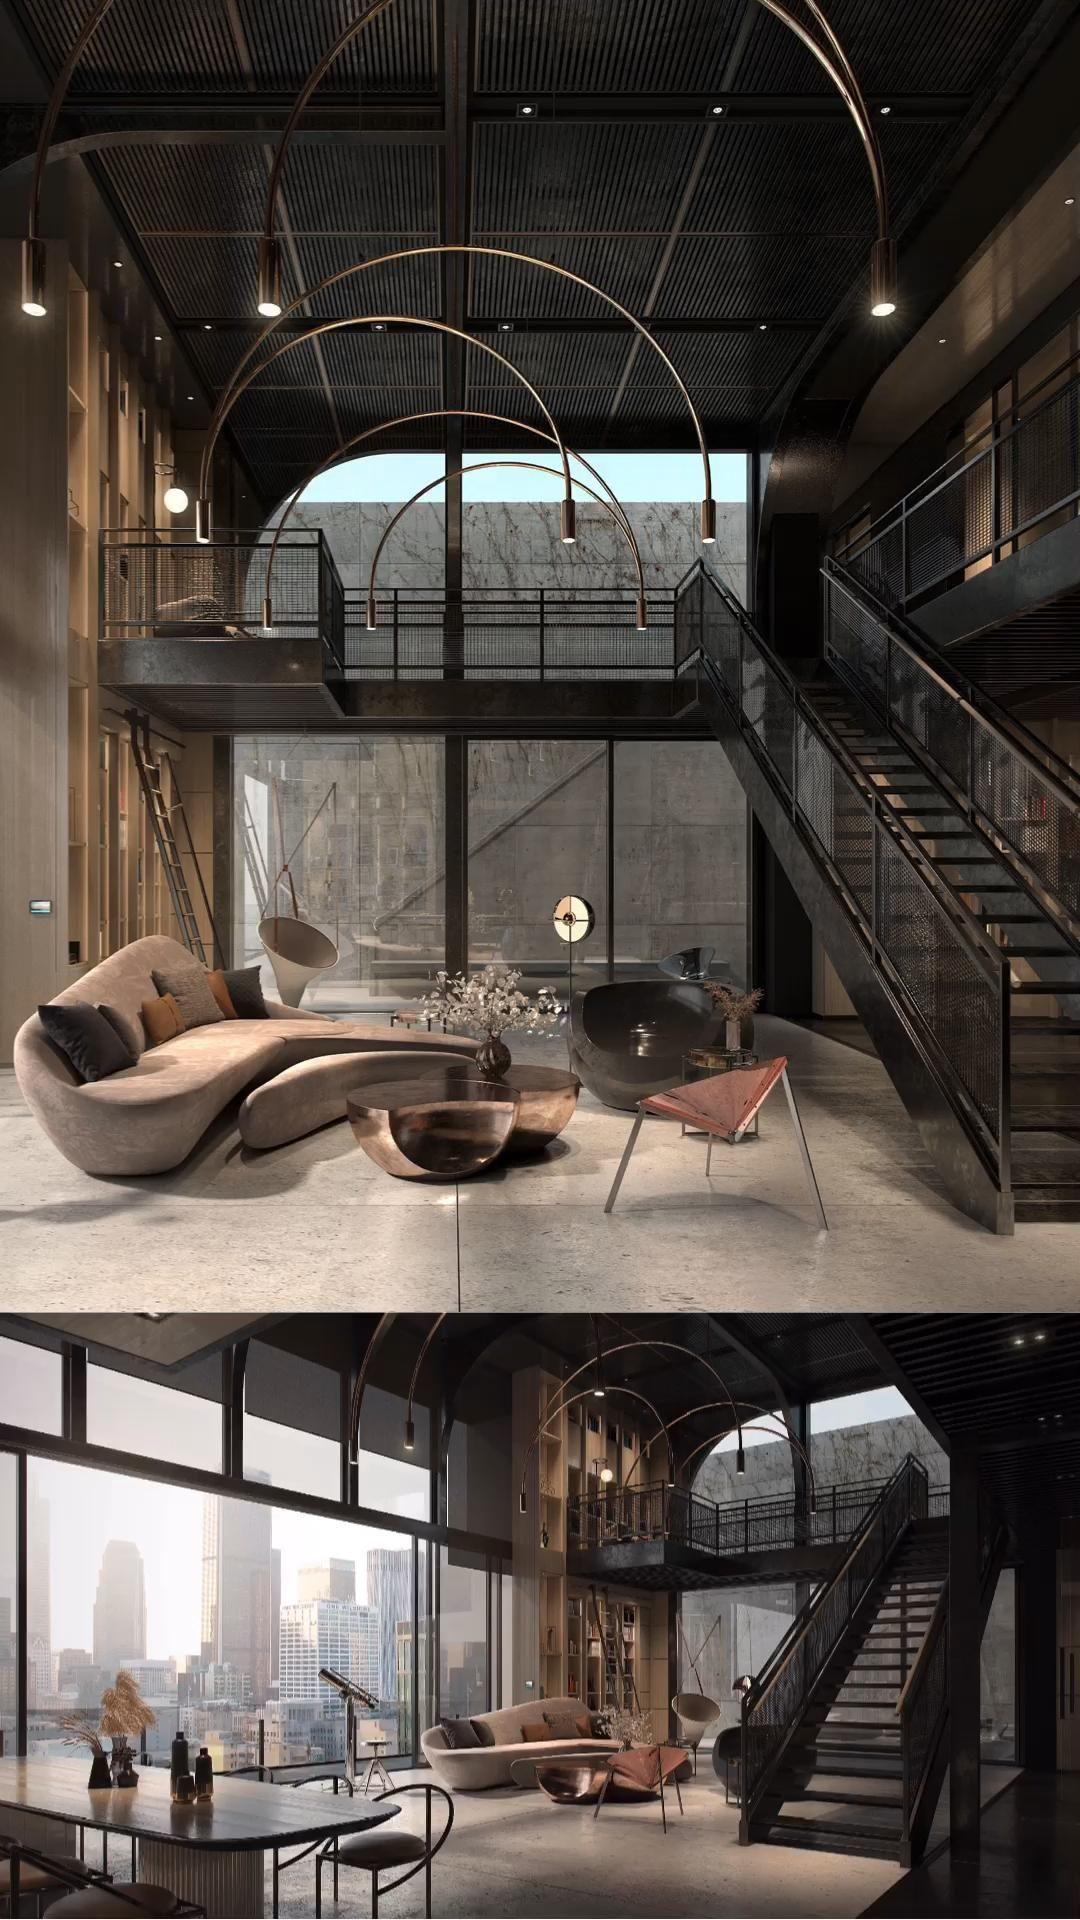 Moonraker - Industrial Loft in downtown Los Angeles, California by Patrick Ng Studio